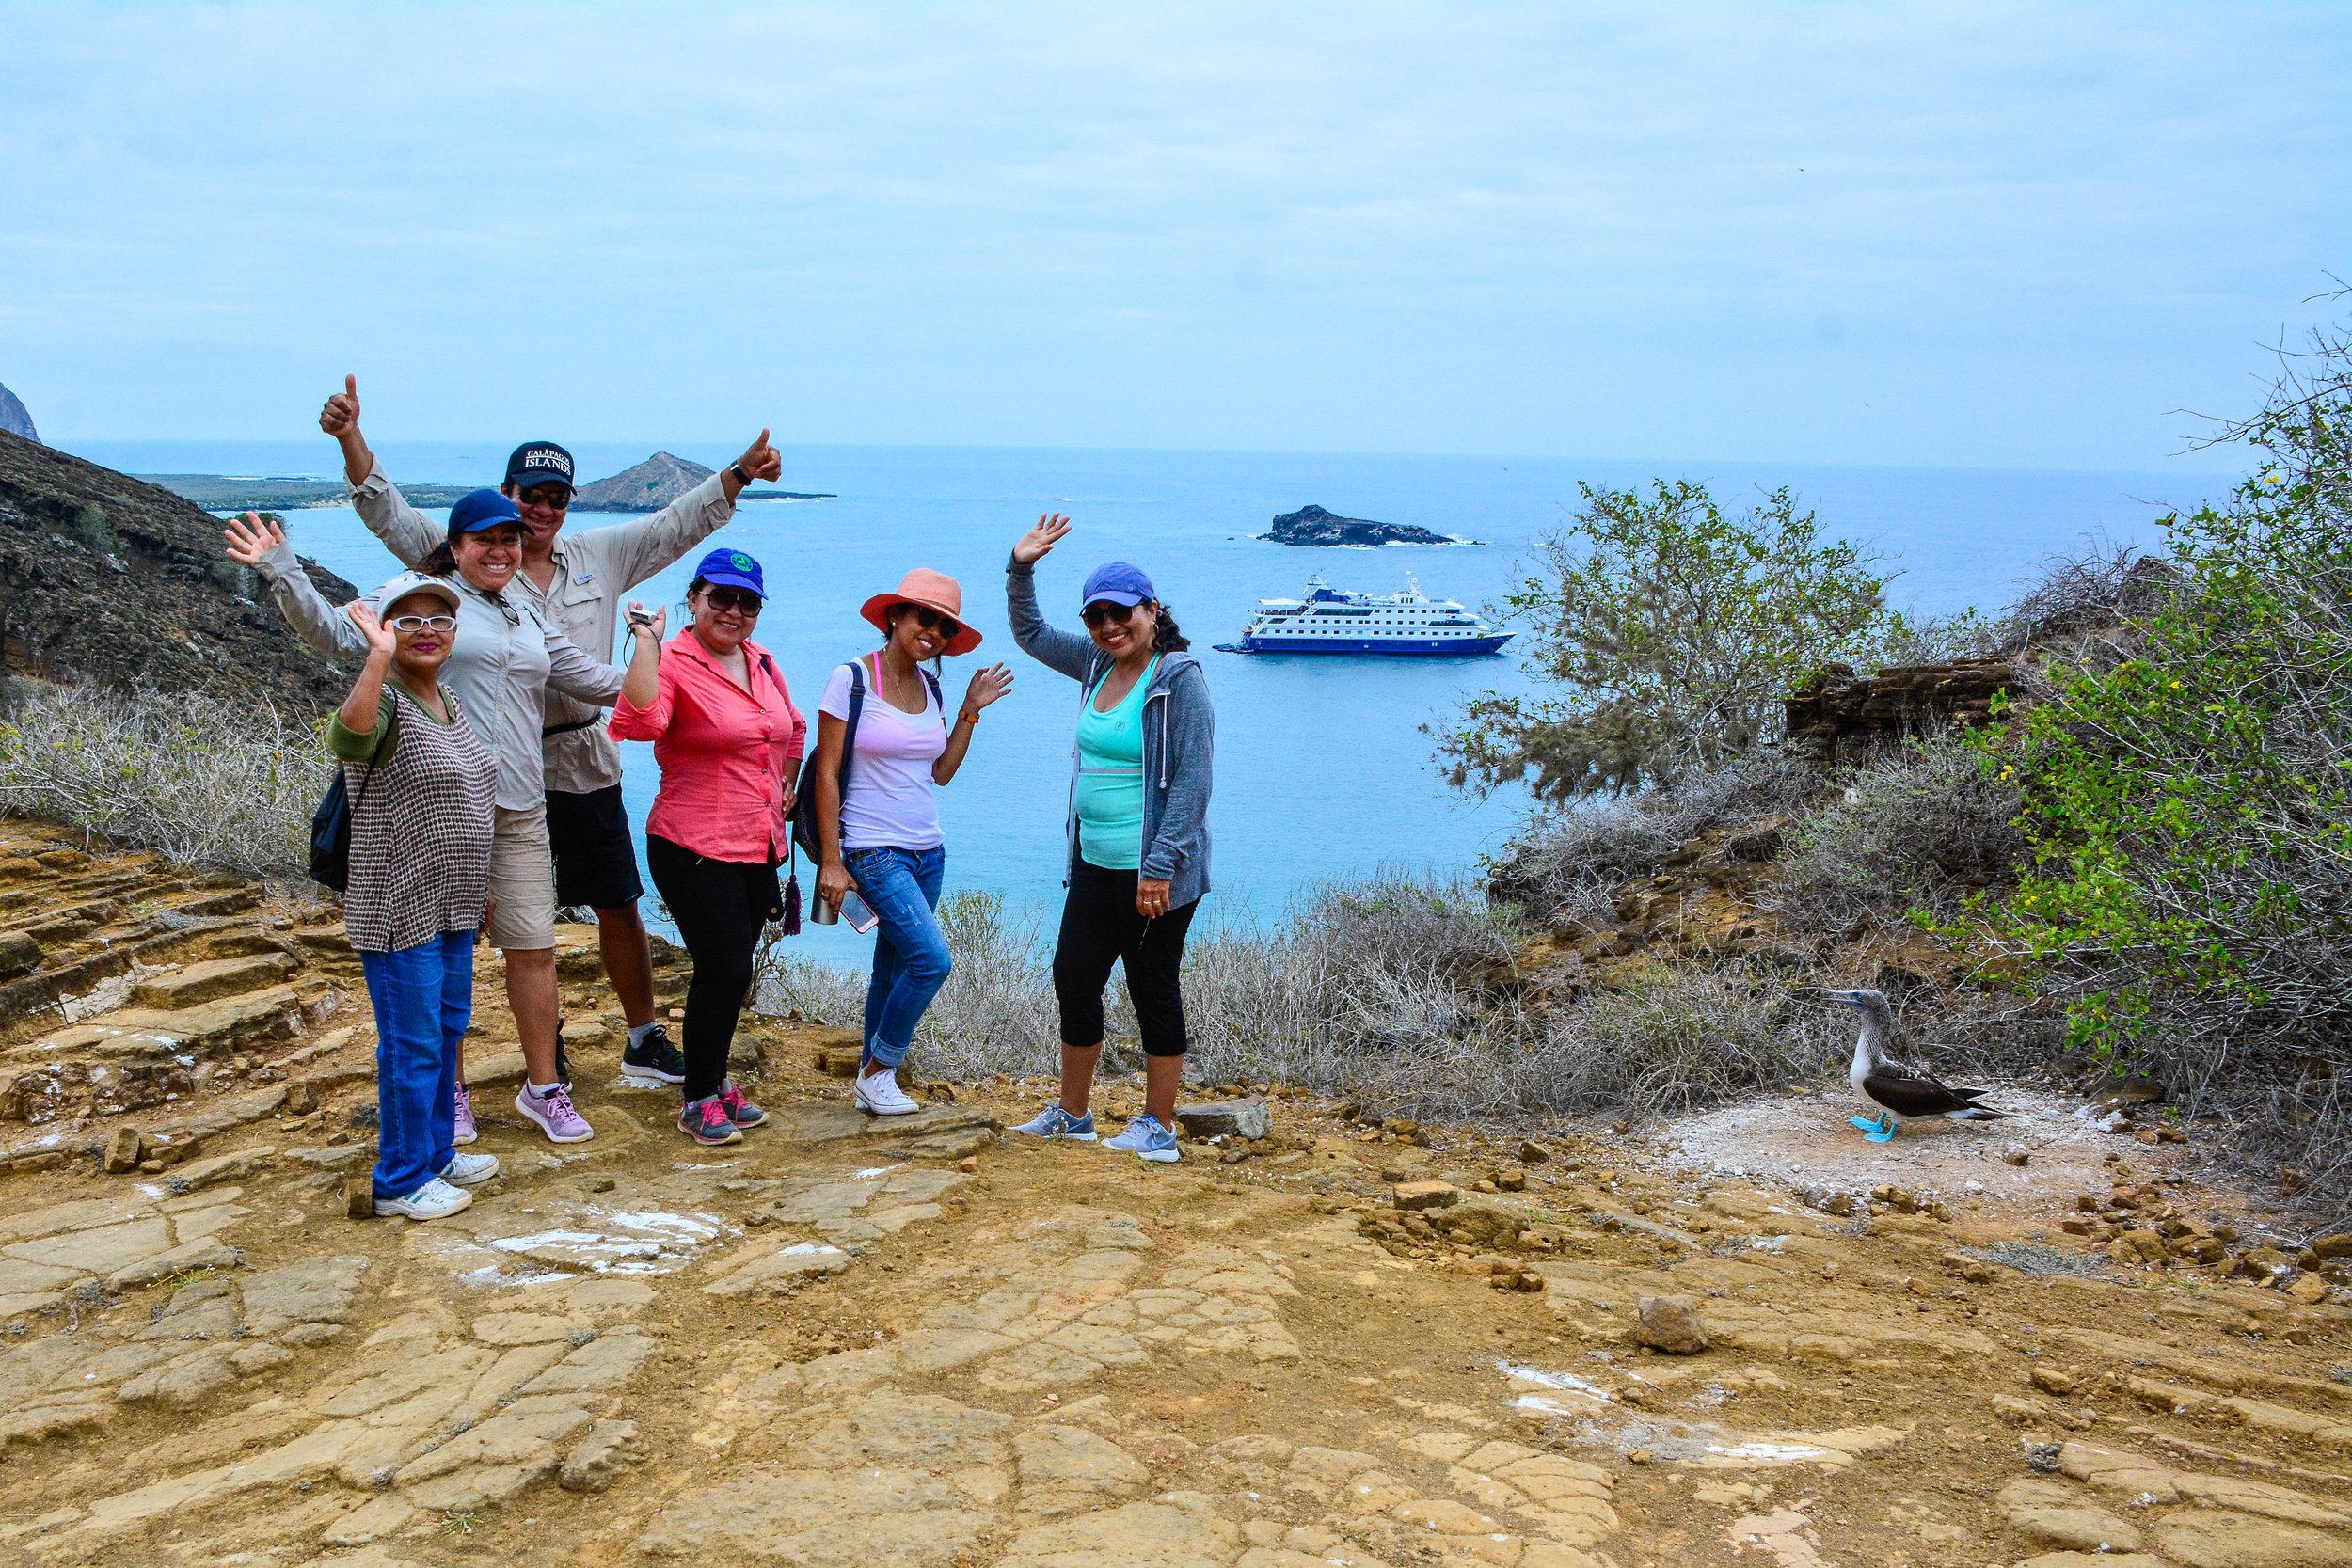 Figura 5 . Grupo de artesanos de Santa Cruz acompañados por la guardaparque Deisy Plaza, sitio de visita Punta Pitt. Foto: Archivo Metropolitan Touring